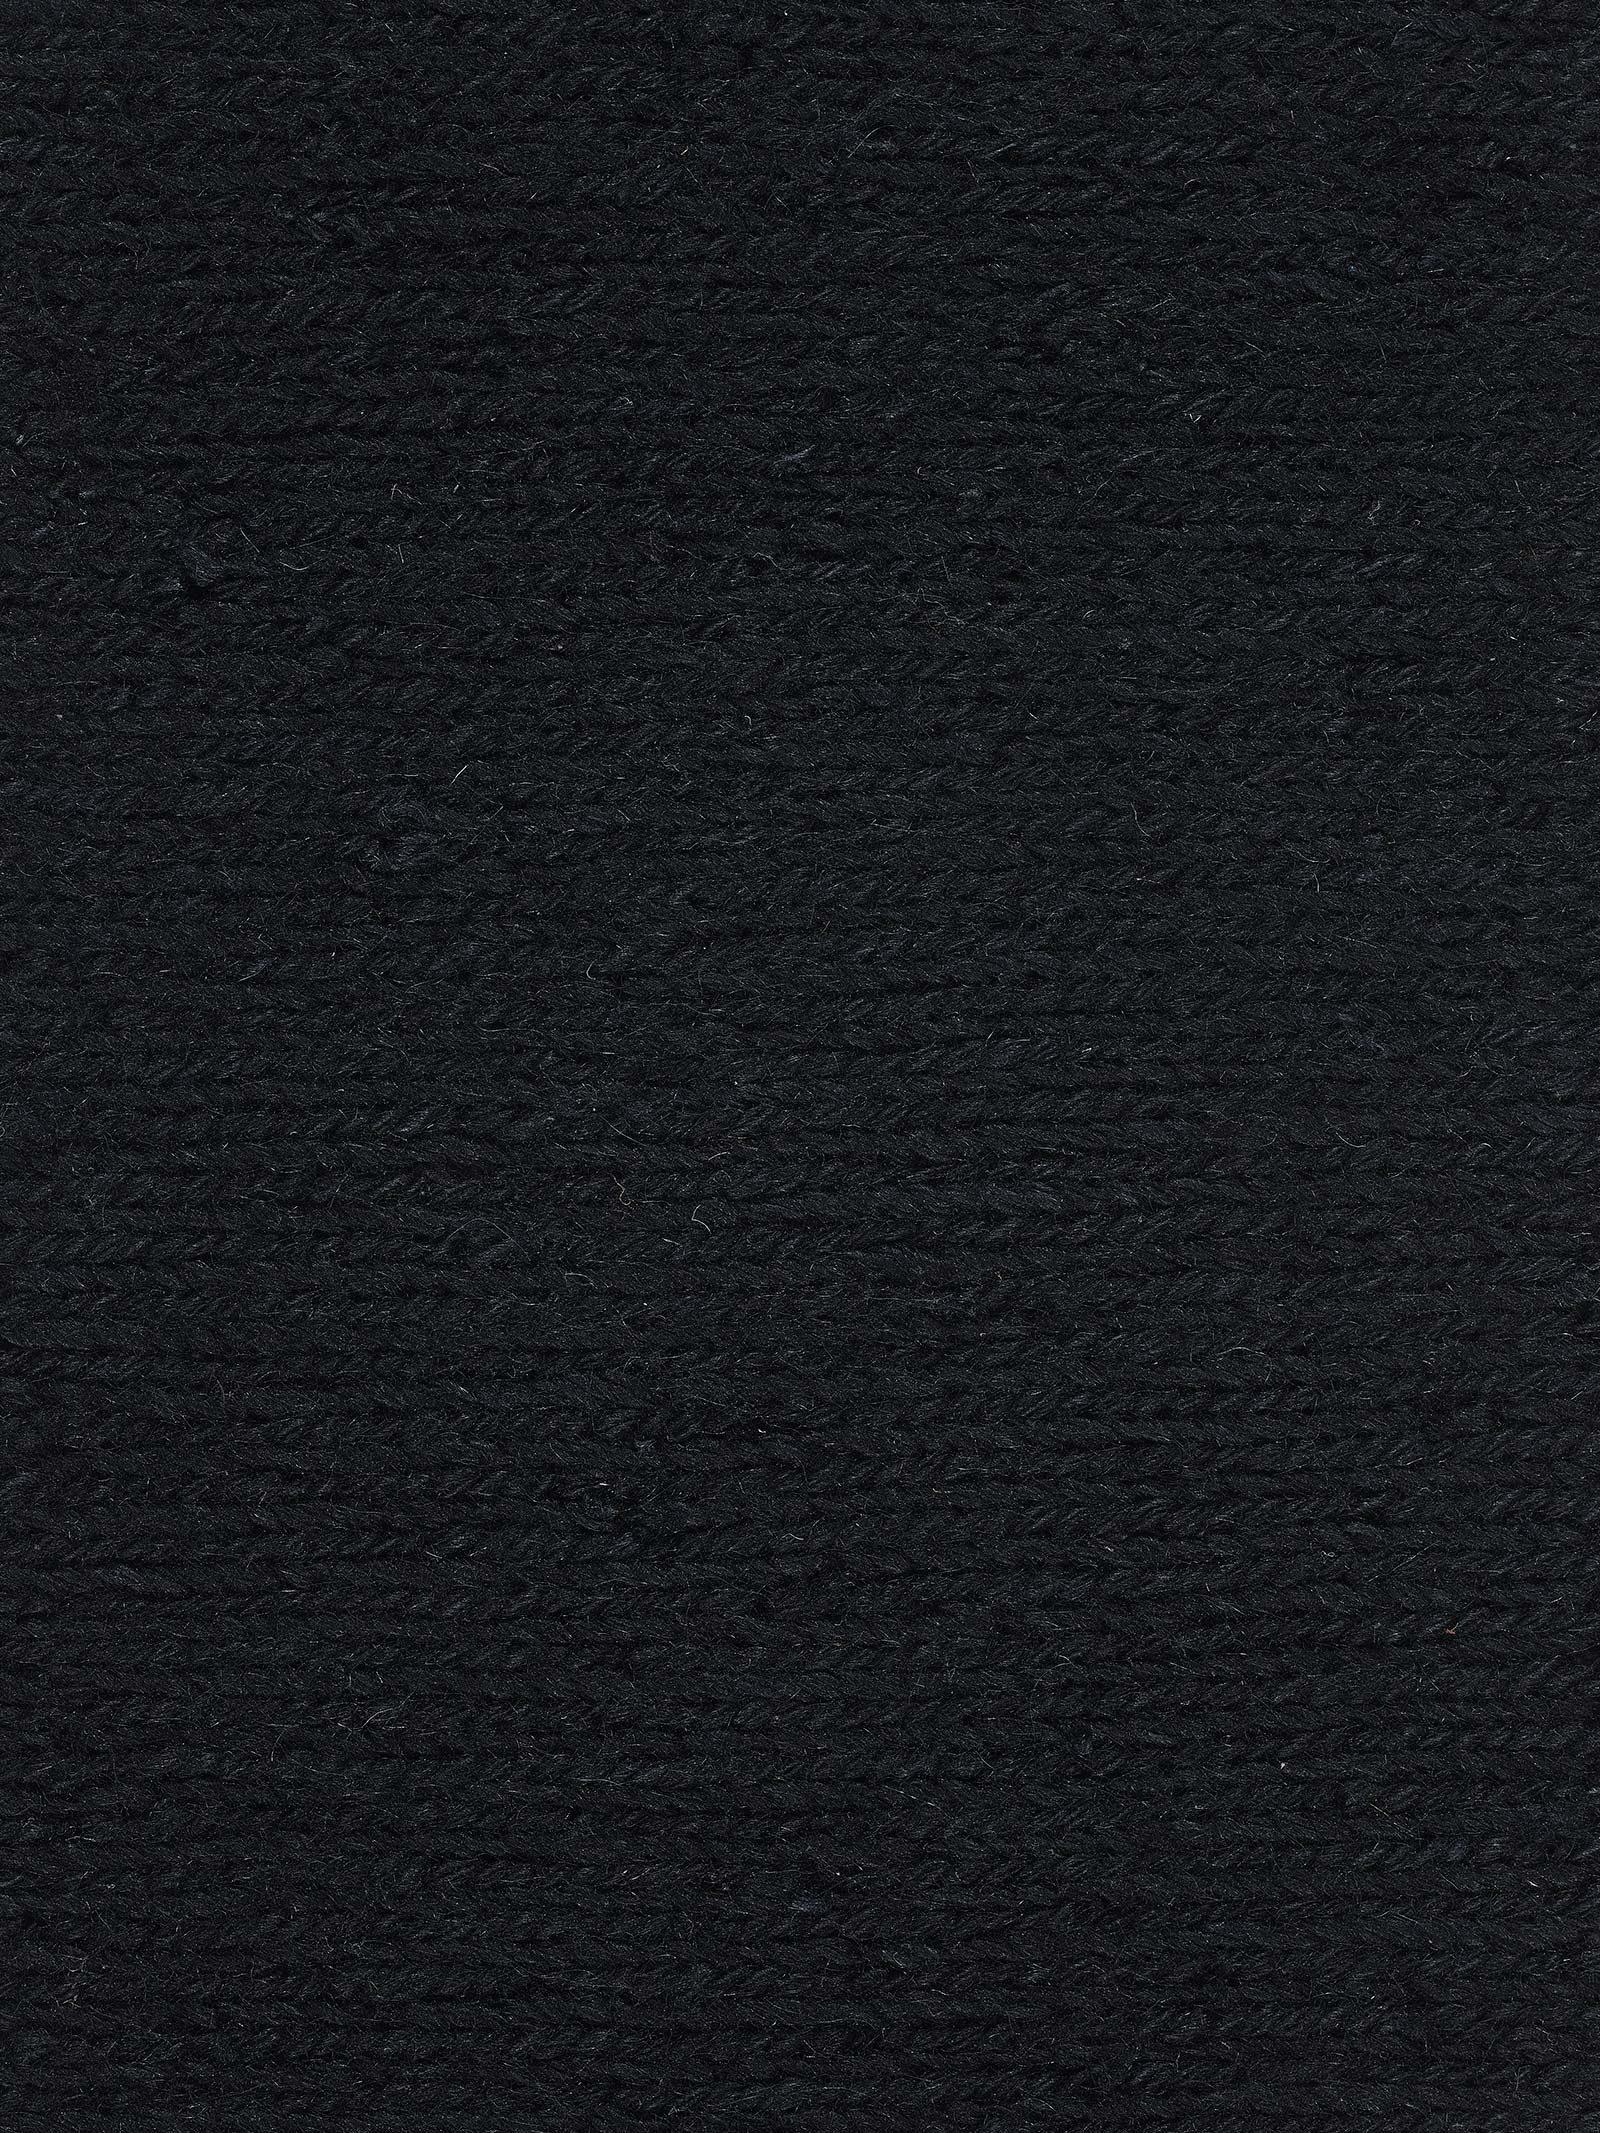 Angelo Rugs Kito LX 4836 D3 3